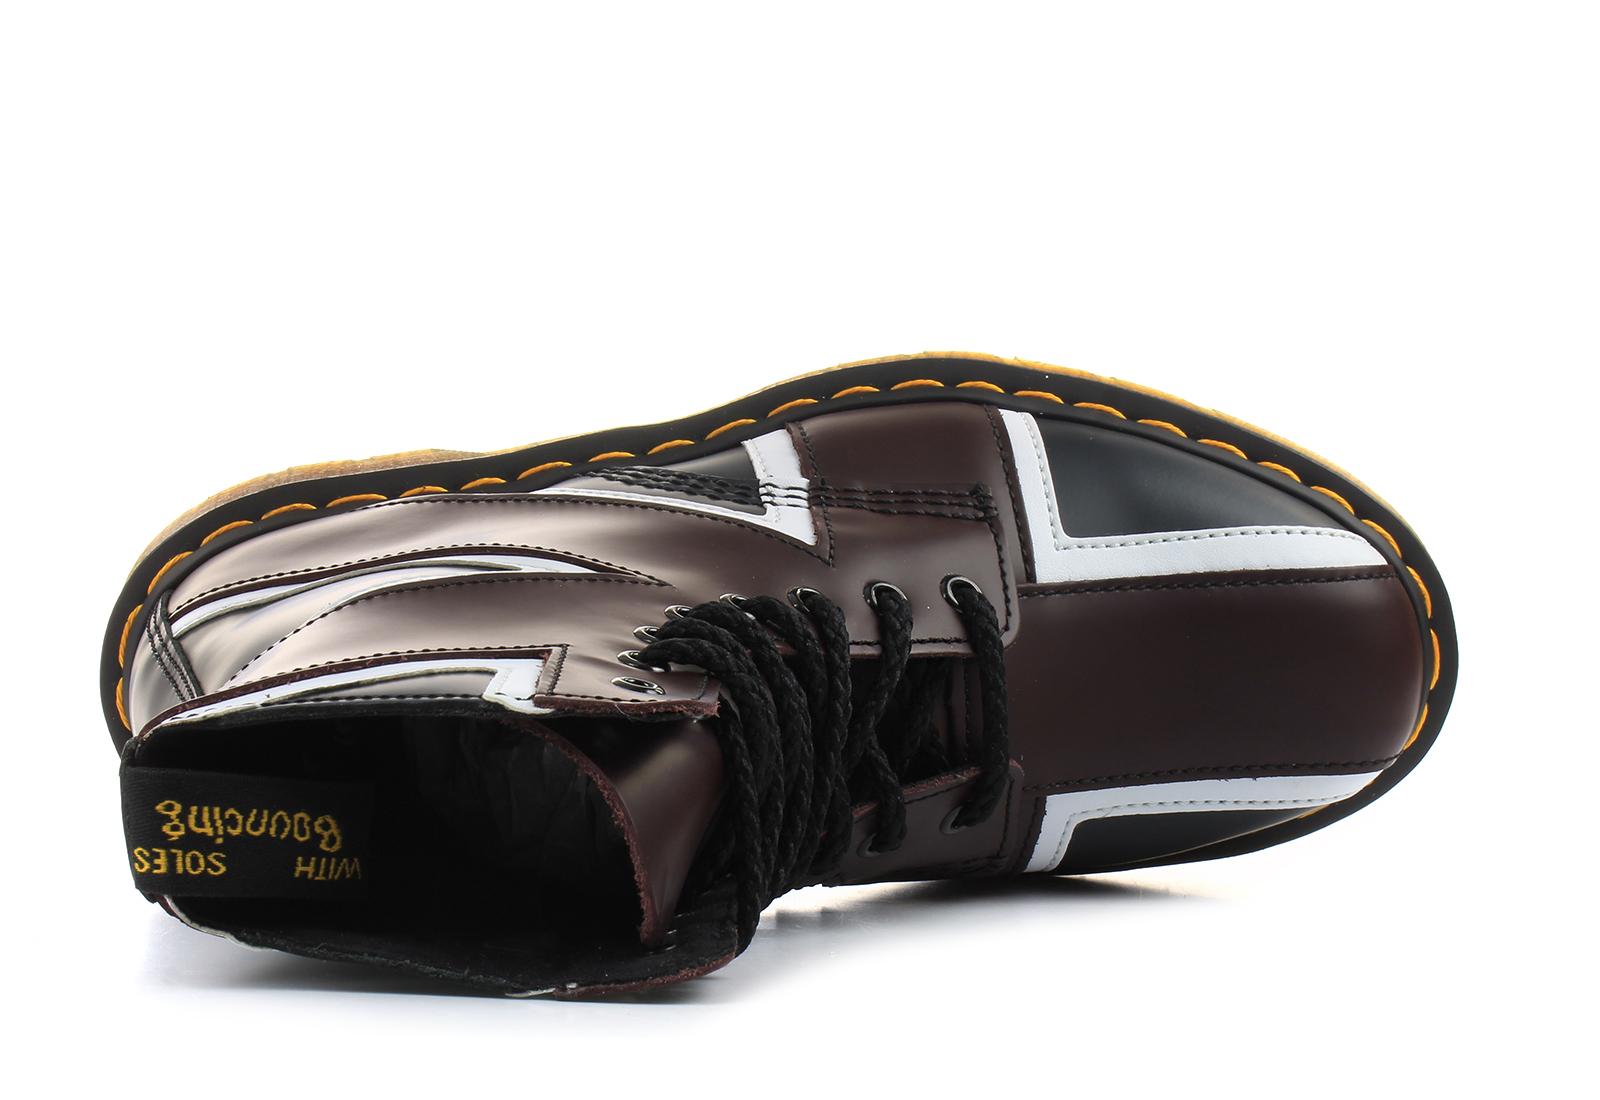 590480f5c193 Dr Martens Boots - Pascal Brit - 8 Eye Boot - DM22774410 - Online ...